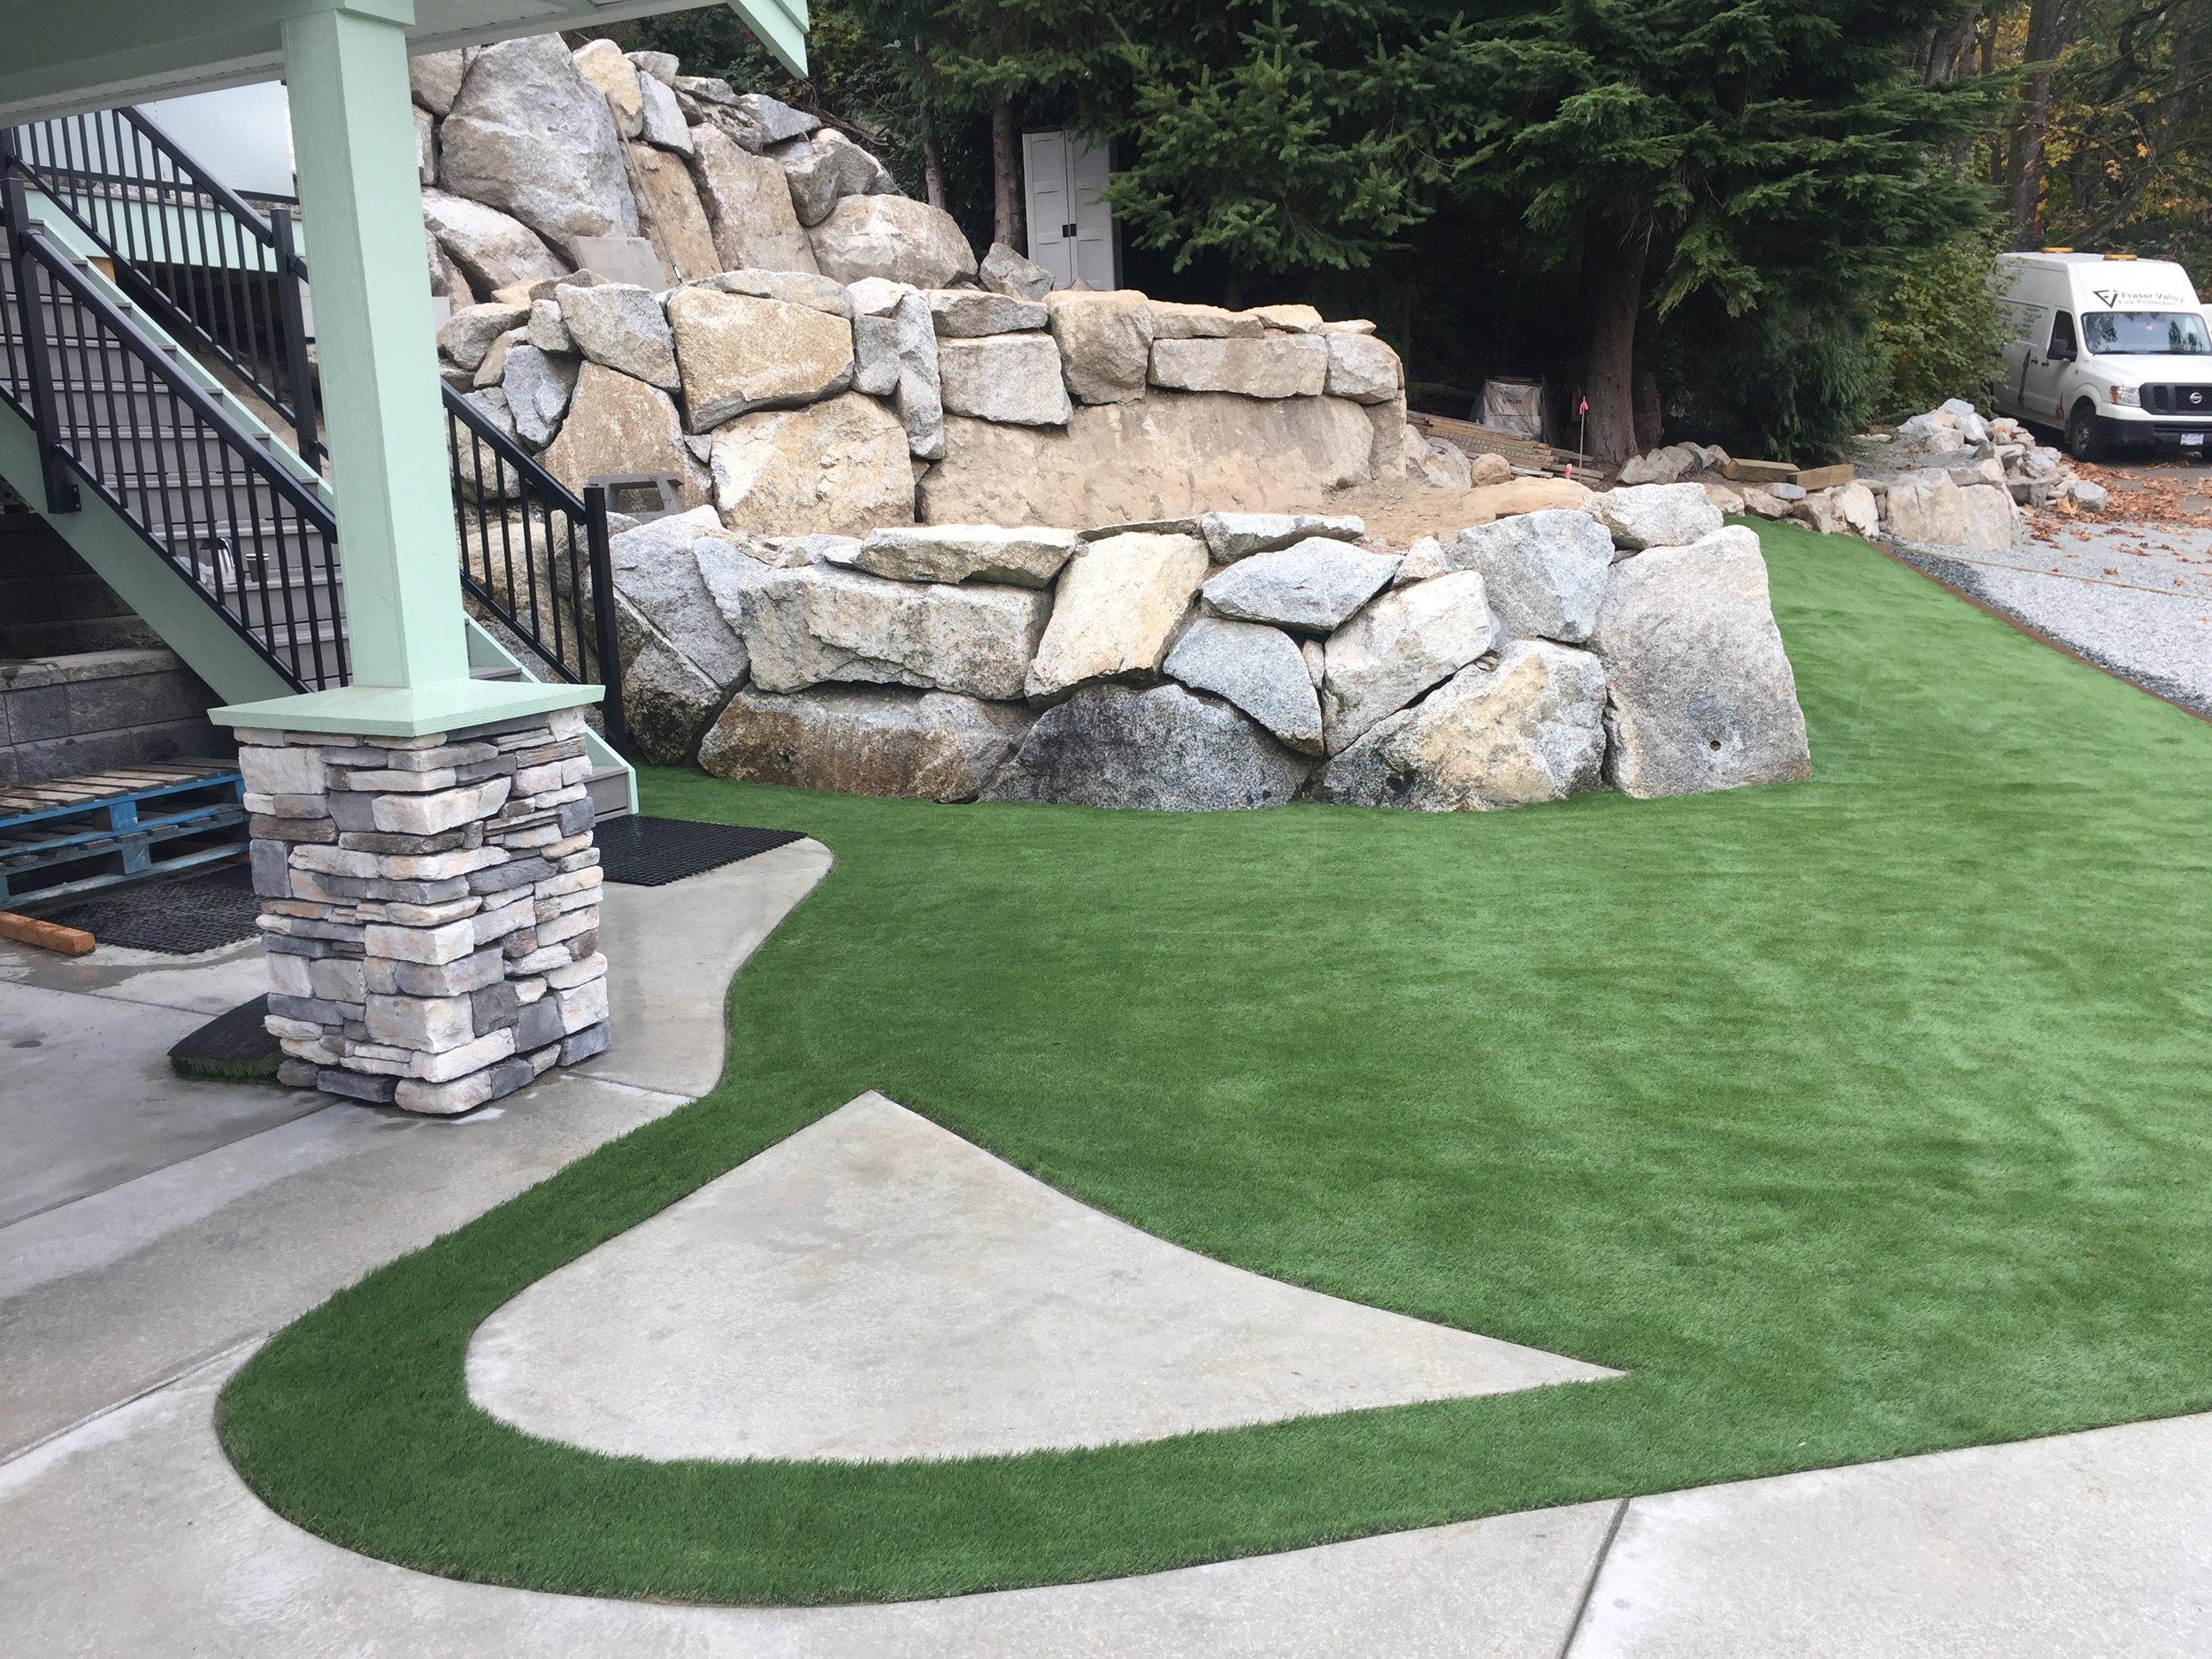 syn grass against rock wall2.jpeg